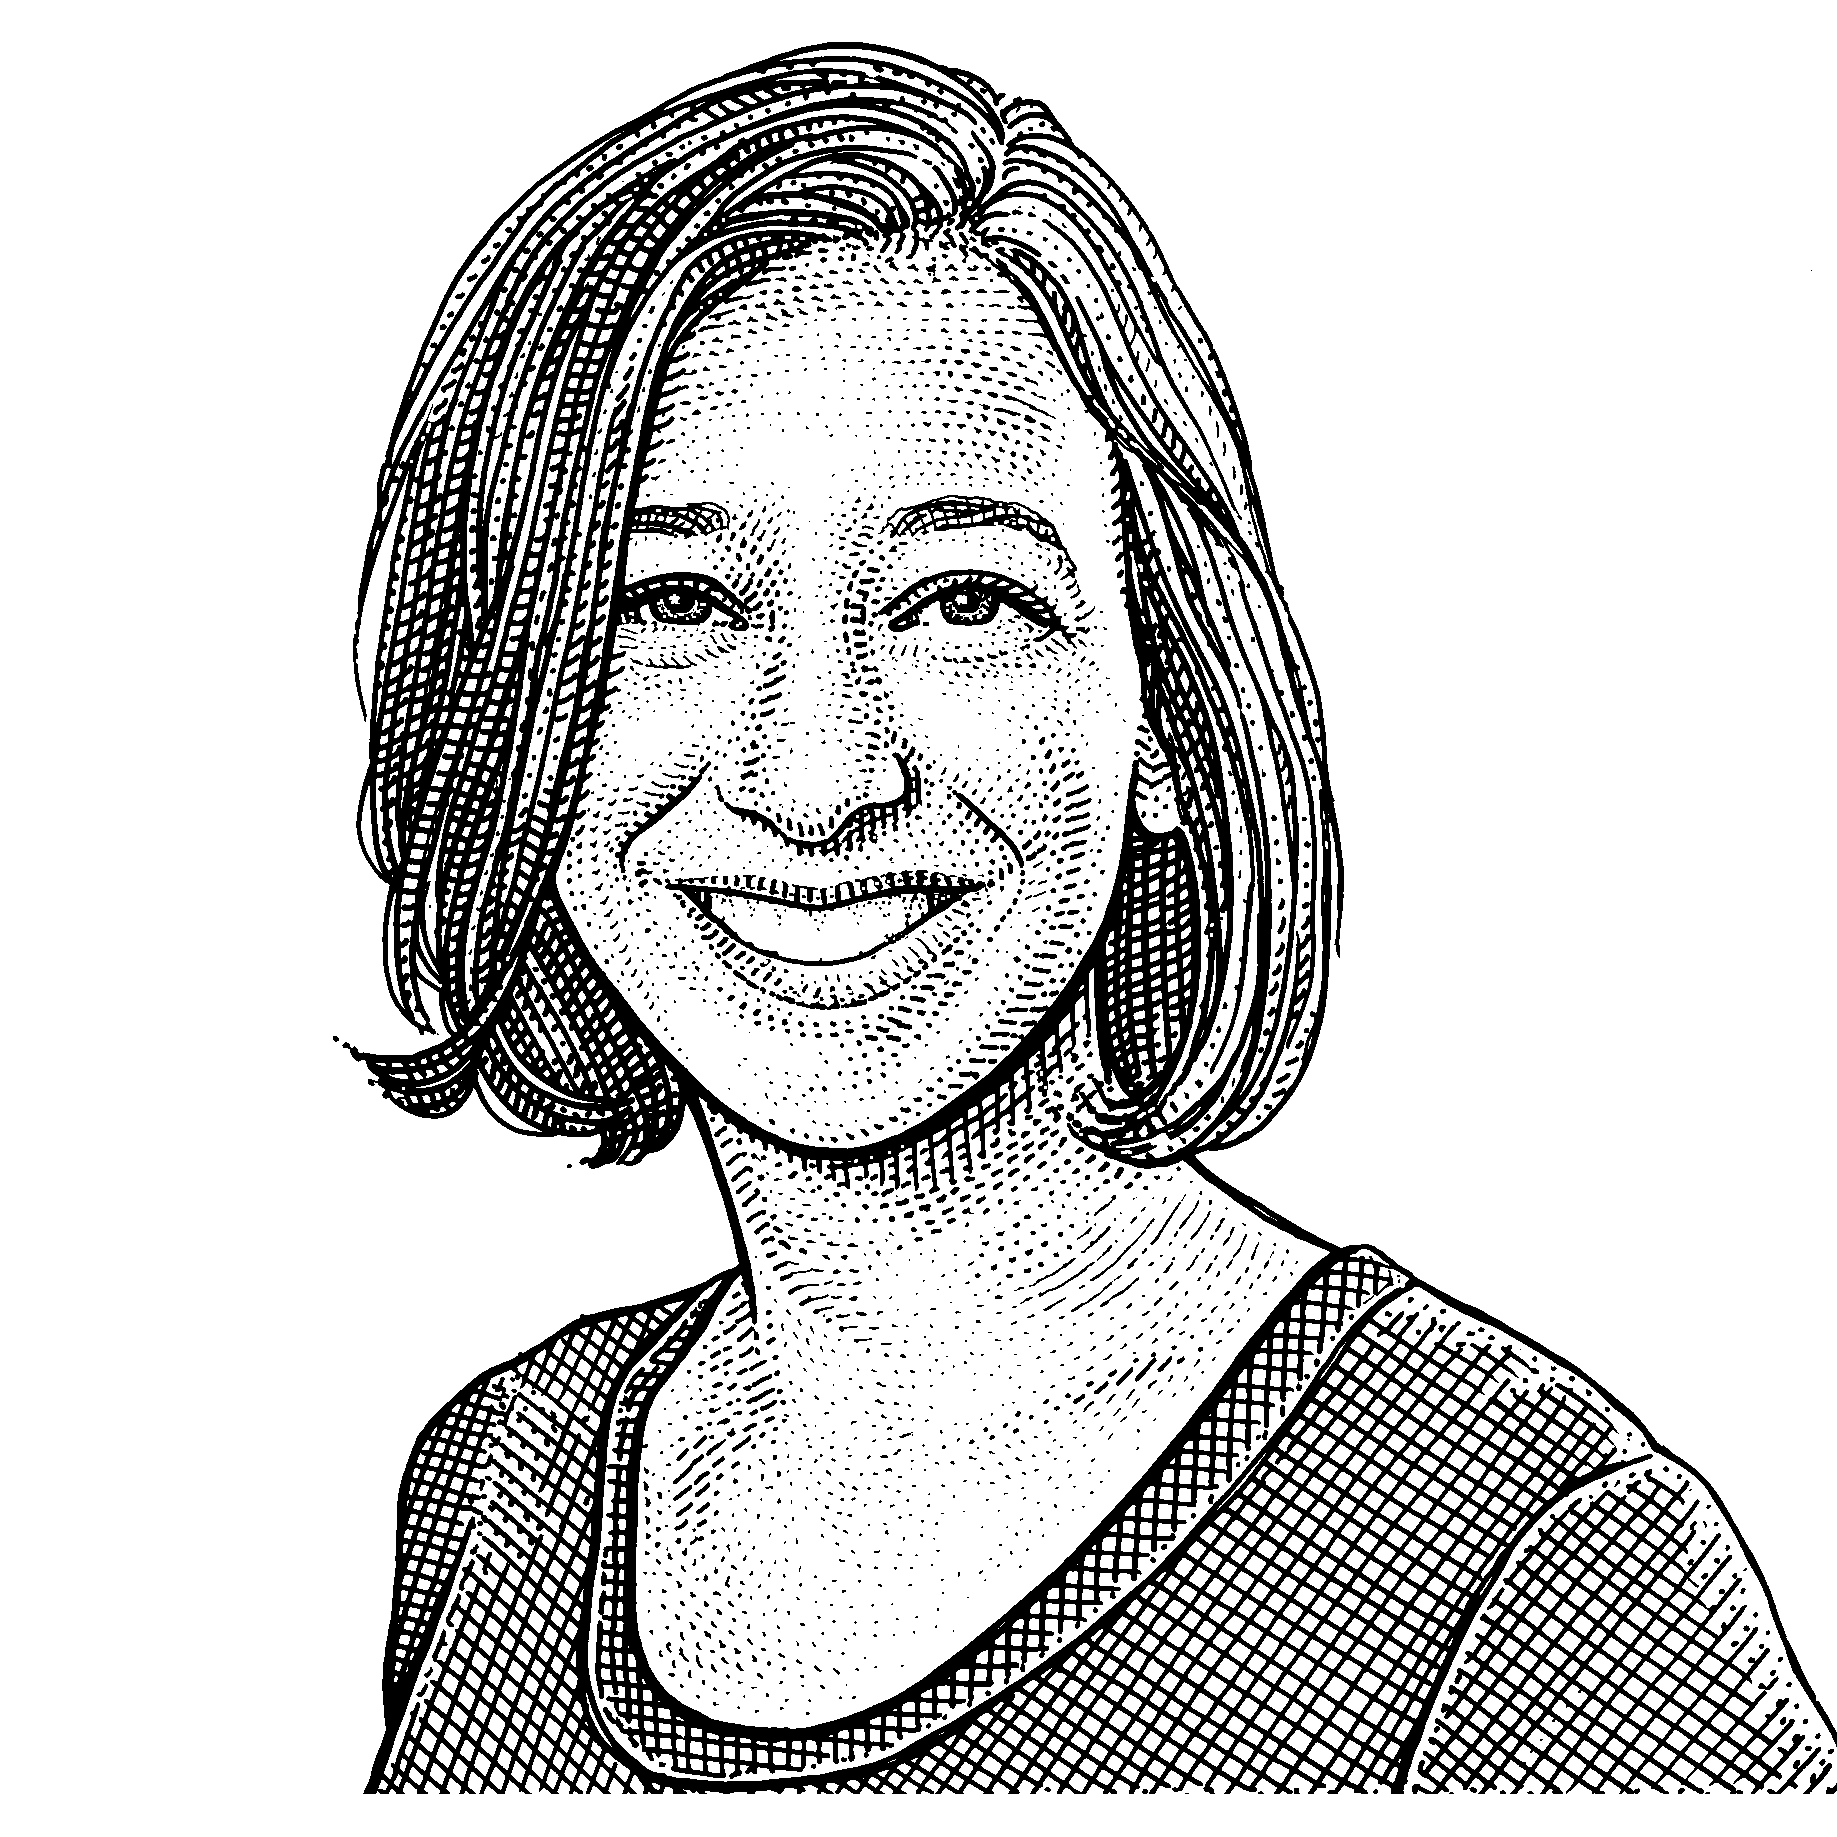 Sarah Krouse